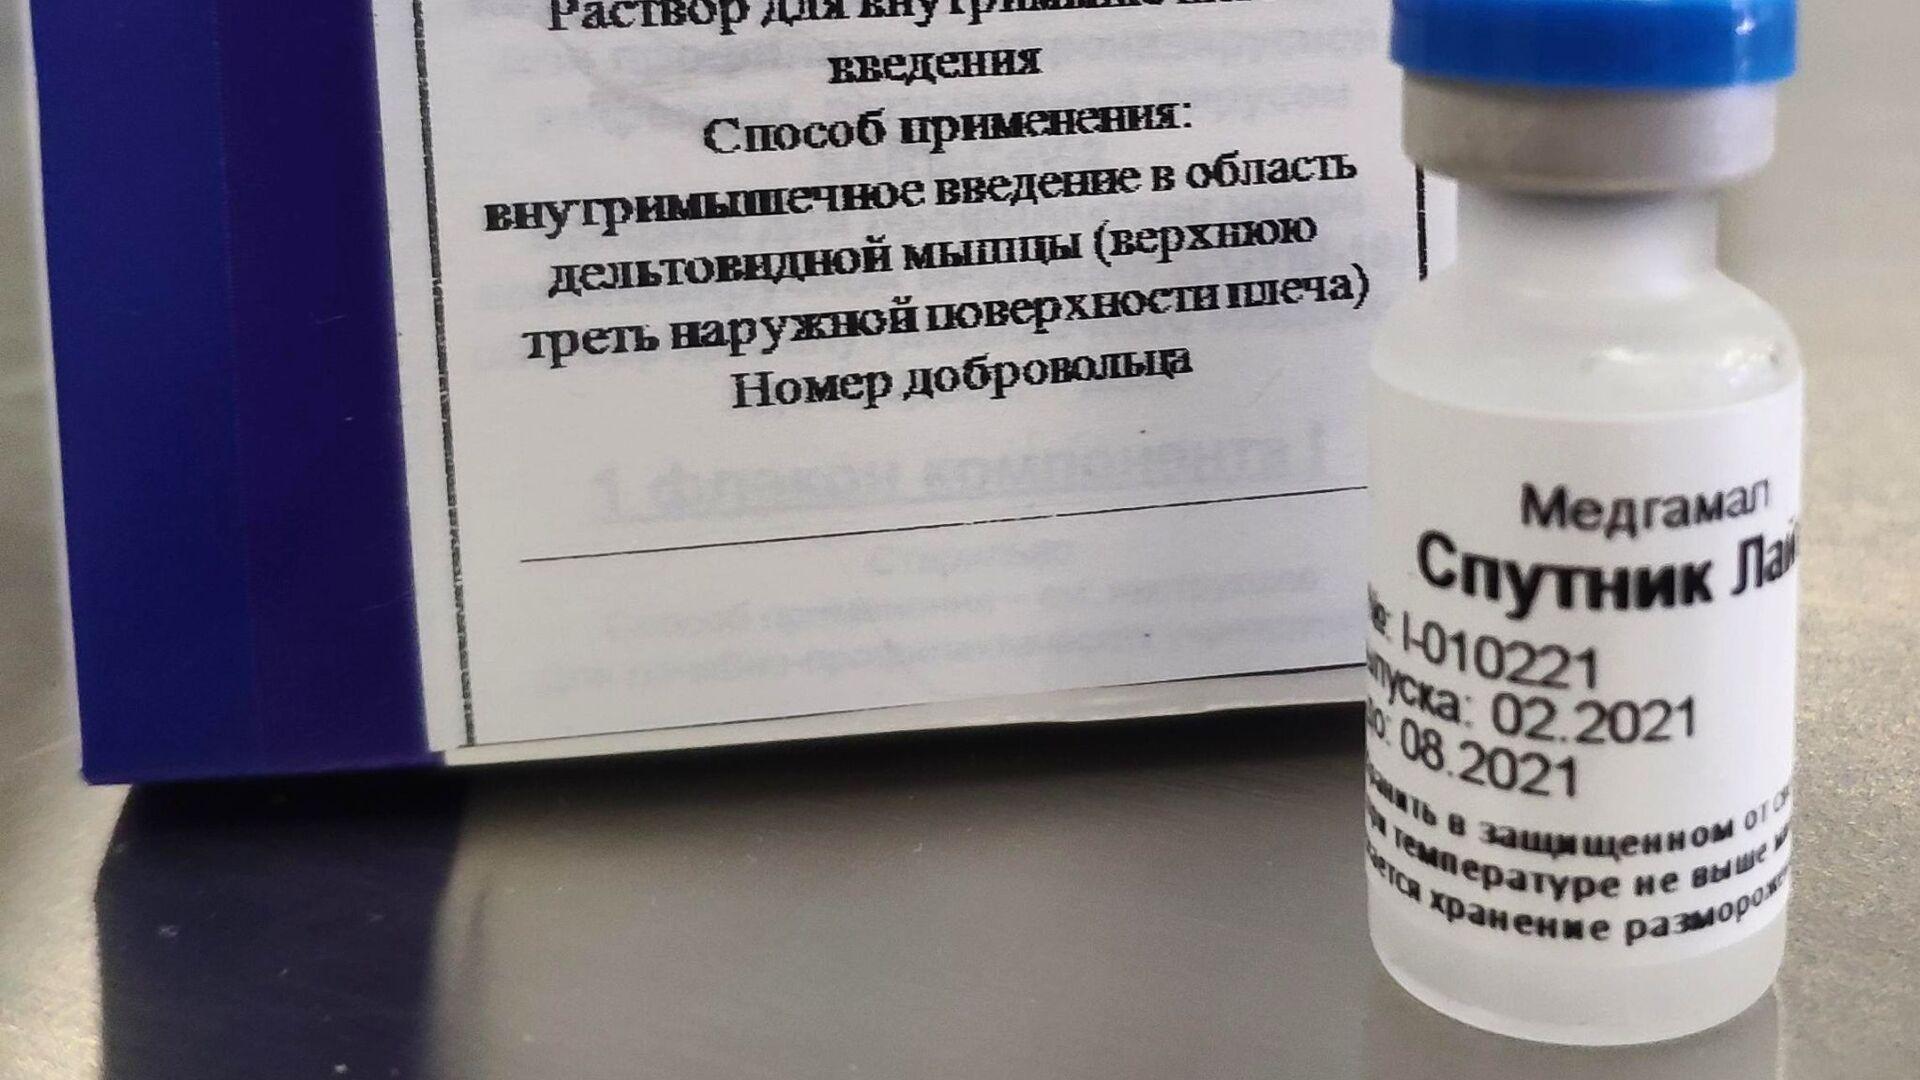 Vakcina protiv kovida Sputnjik lajt - Sputnik Srbija, 1920, 14.10.2021